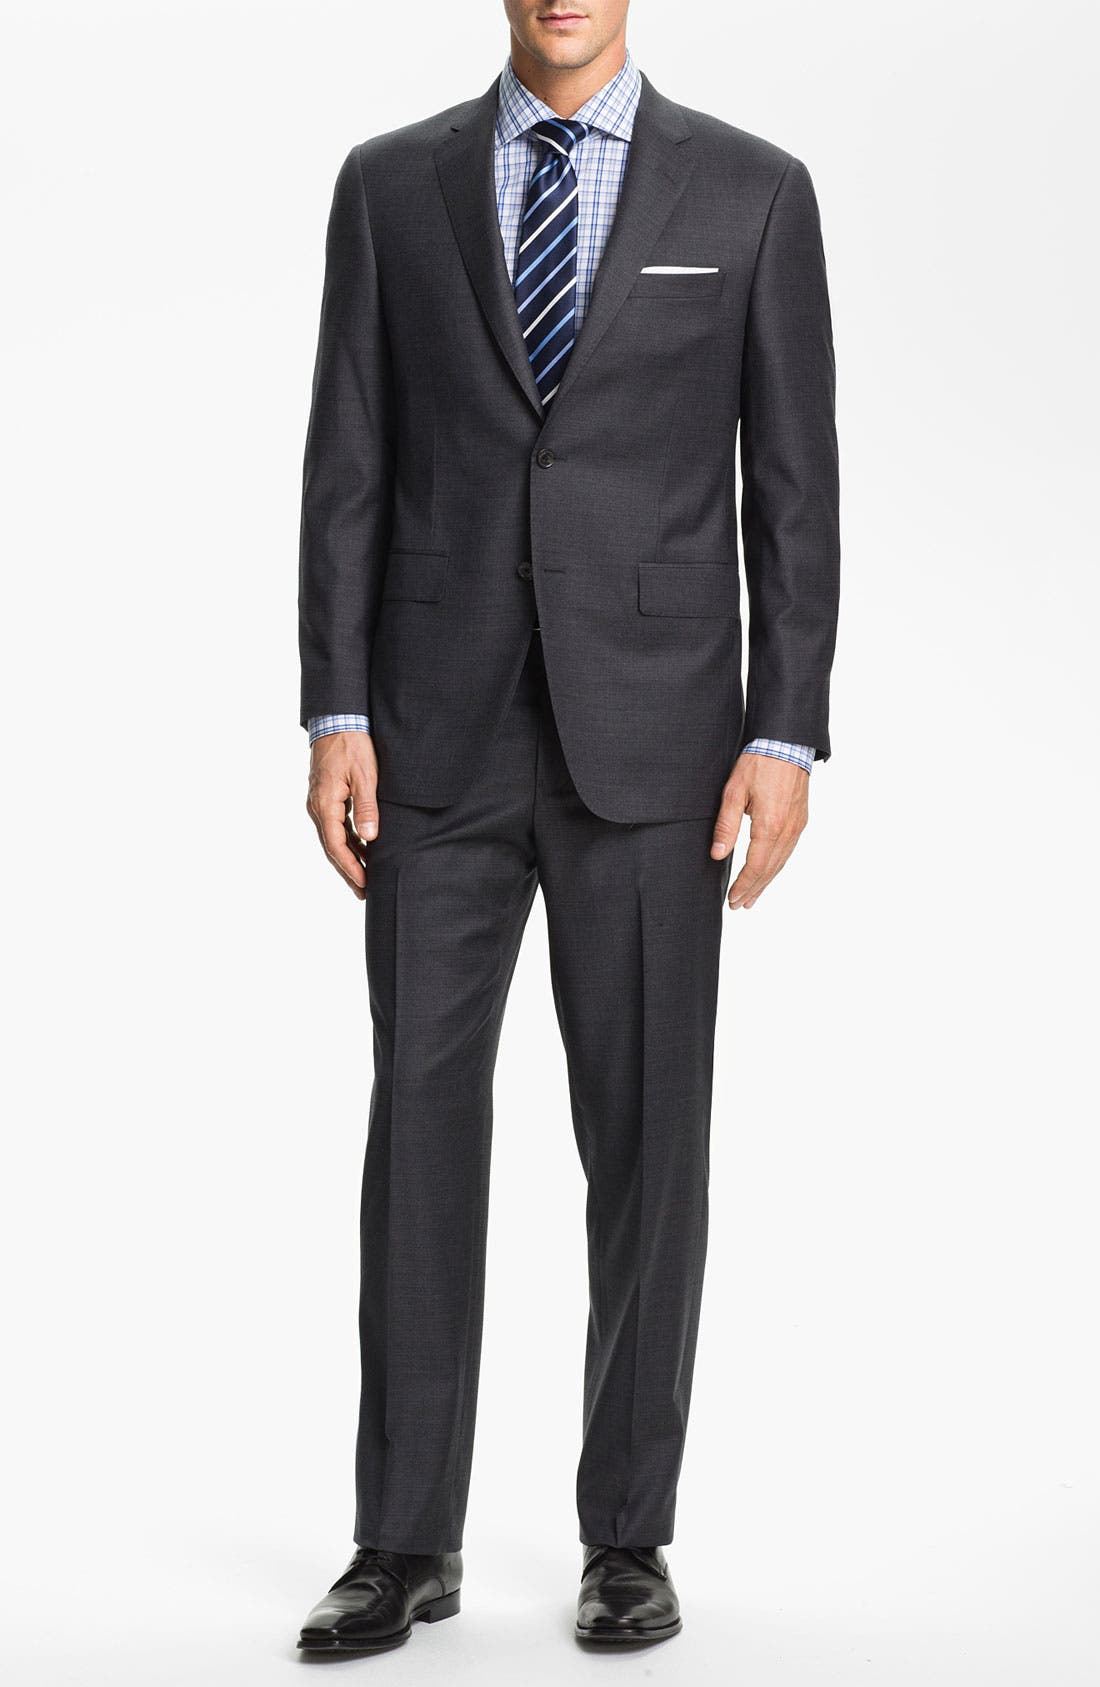 SAMUELSOHN 'Performance' Stretch Wool Suit, Main, color, 020